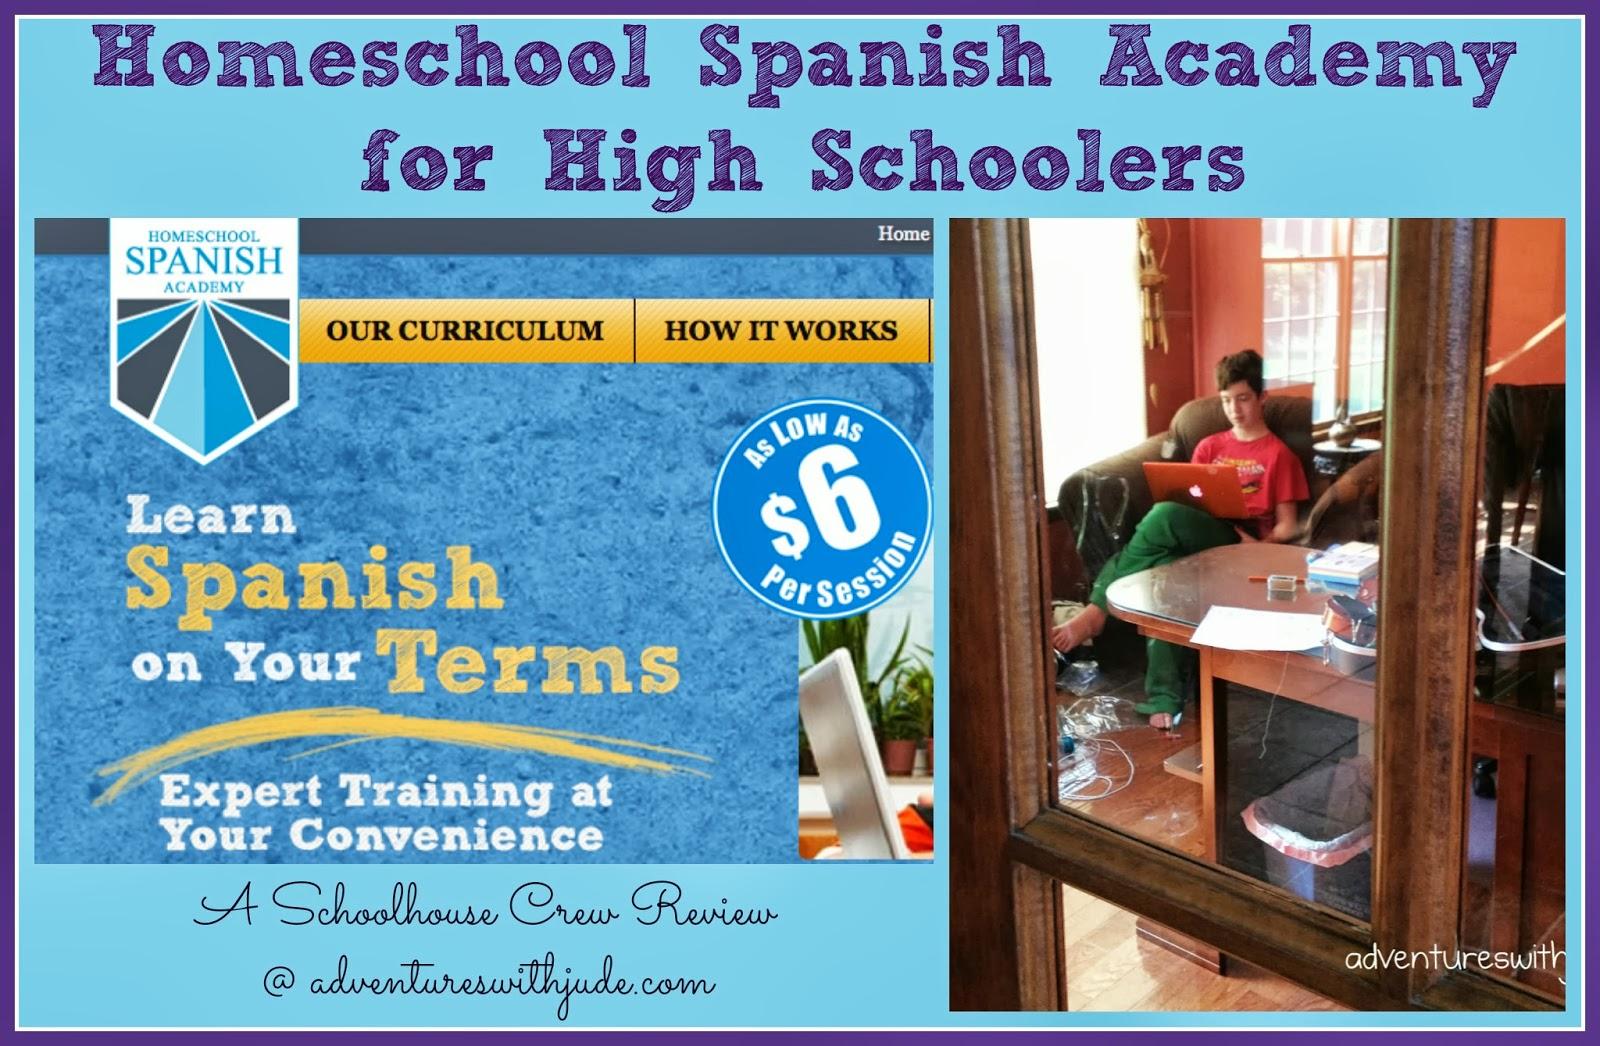 Adventures with Jude: Homeschool Spanish Academy (A